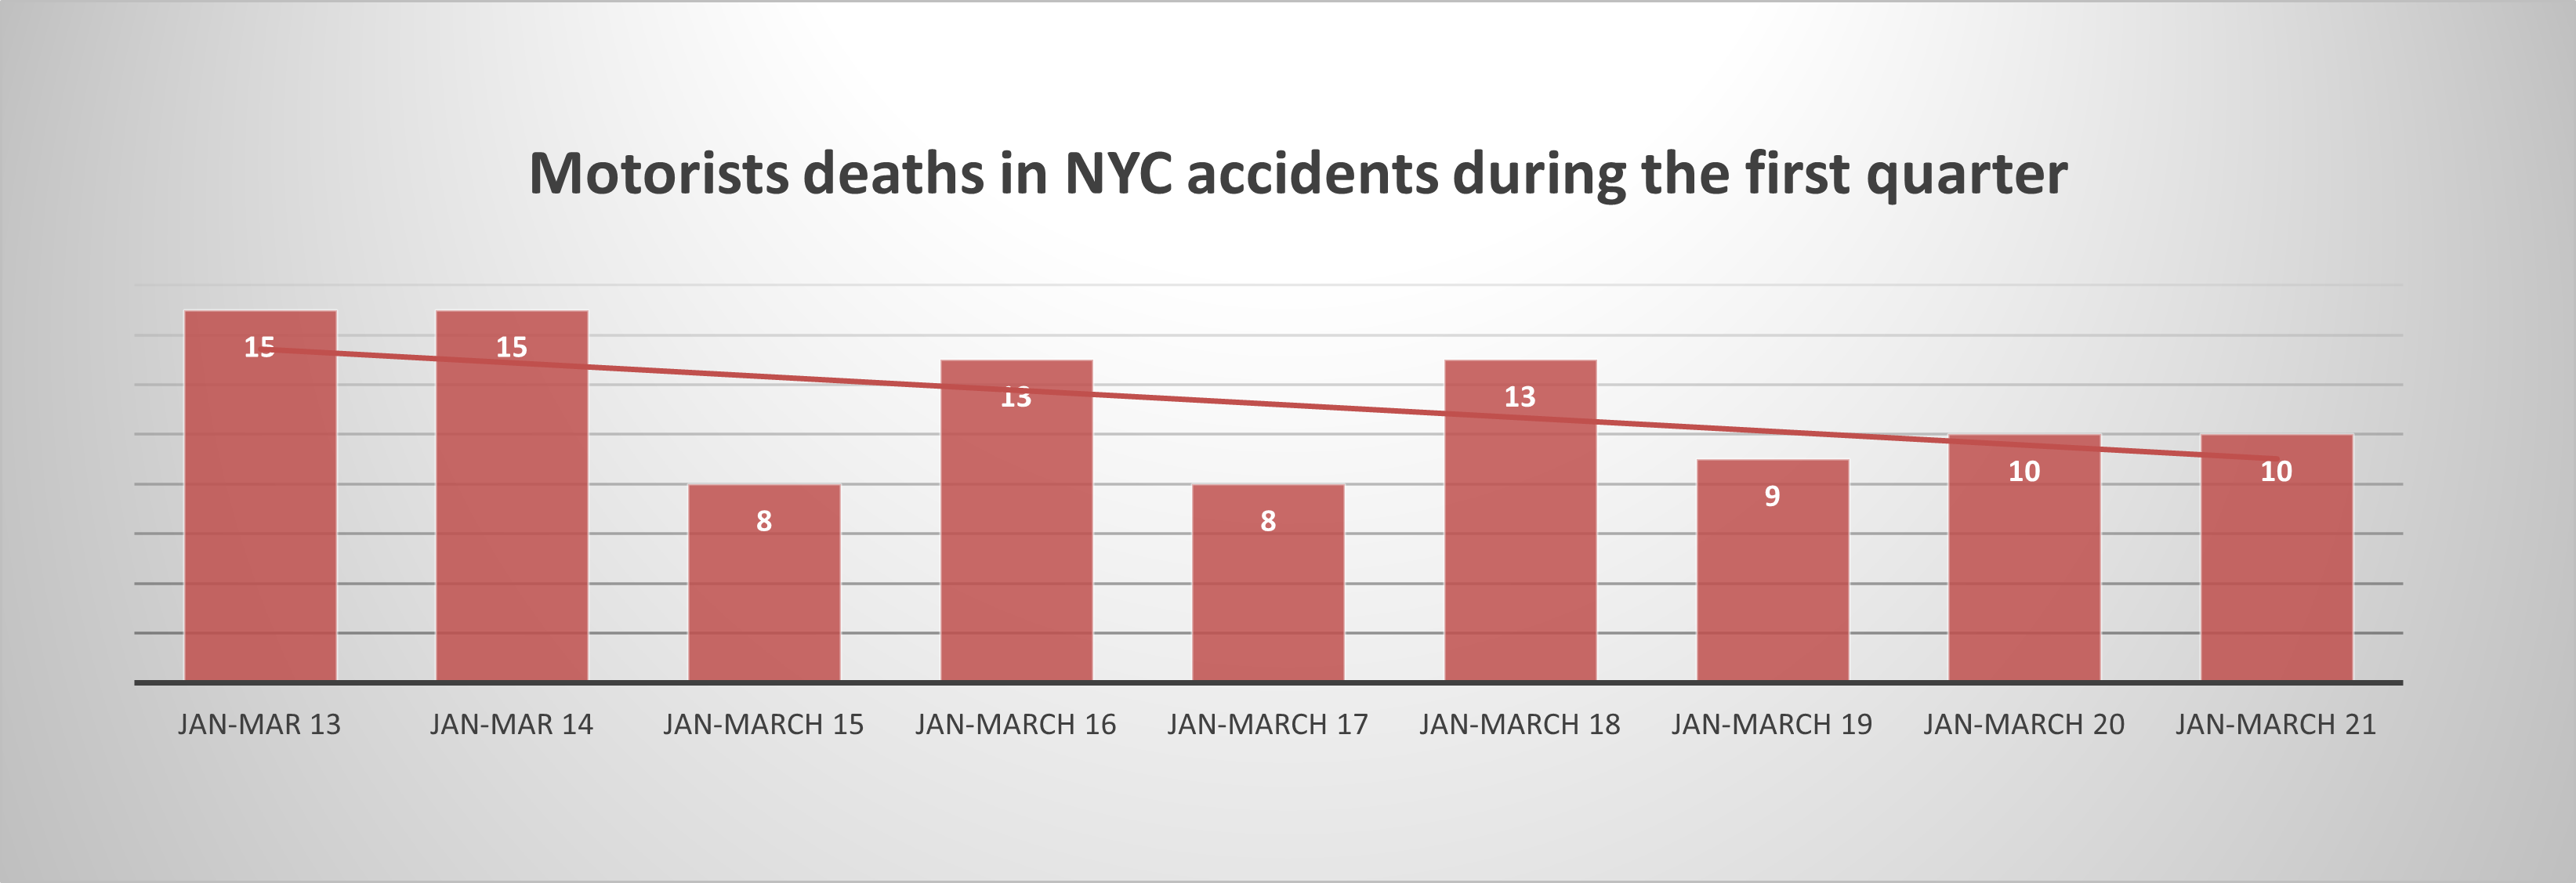 motorist deaths NYC Q1 2021